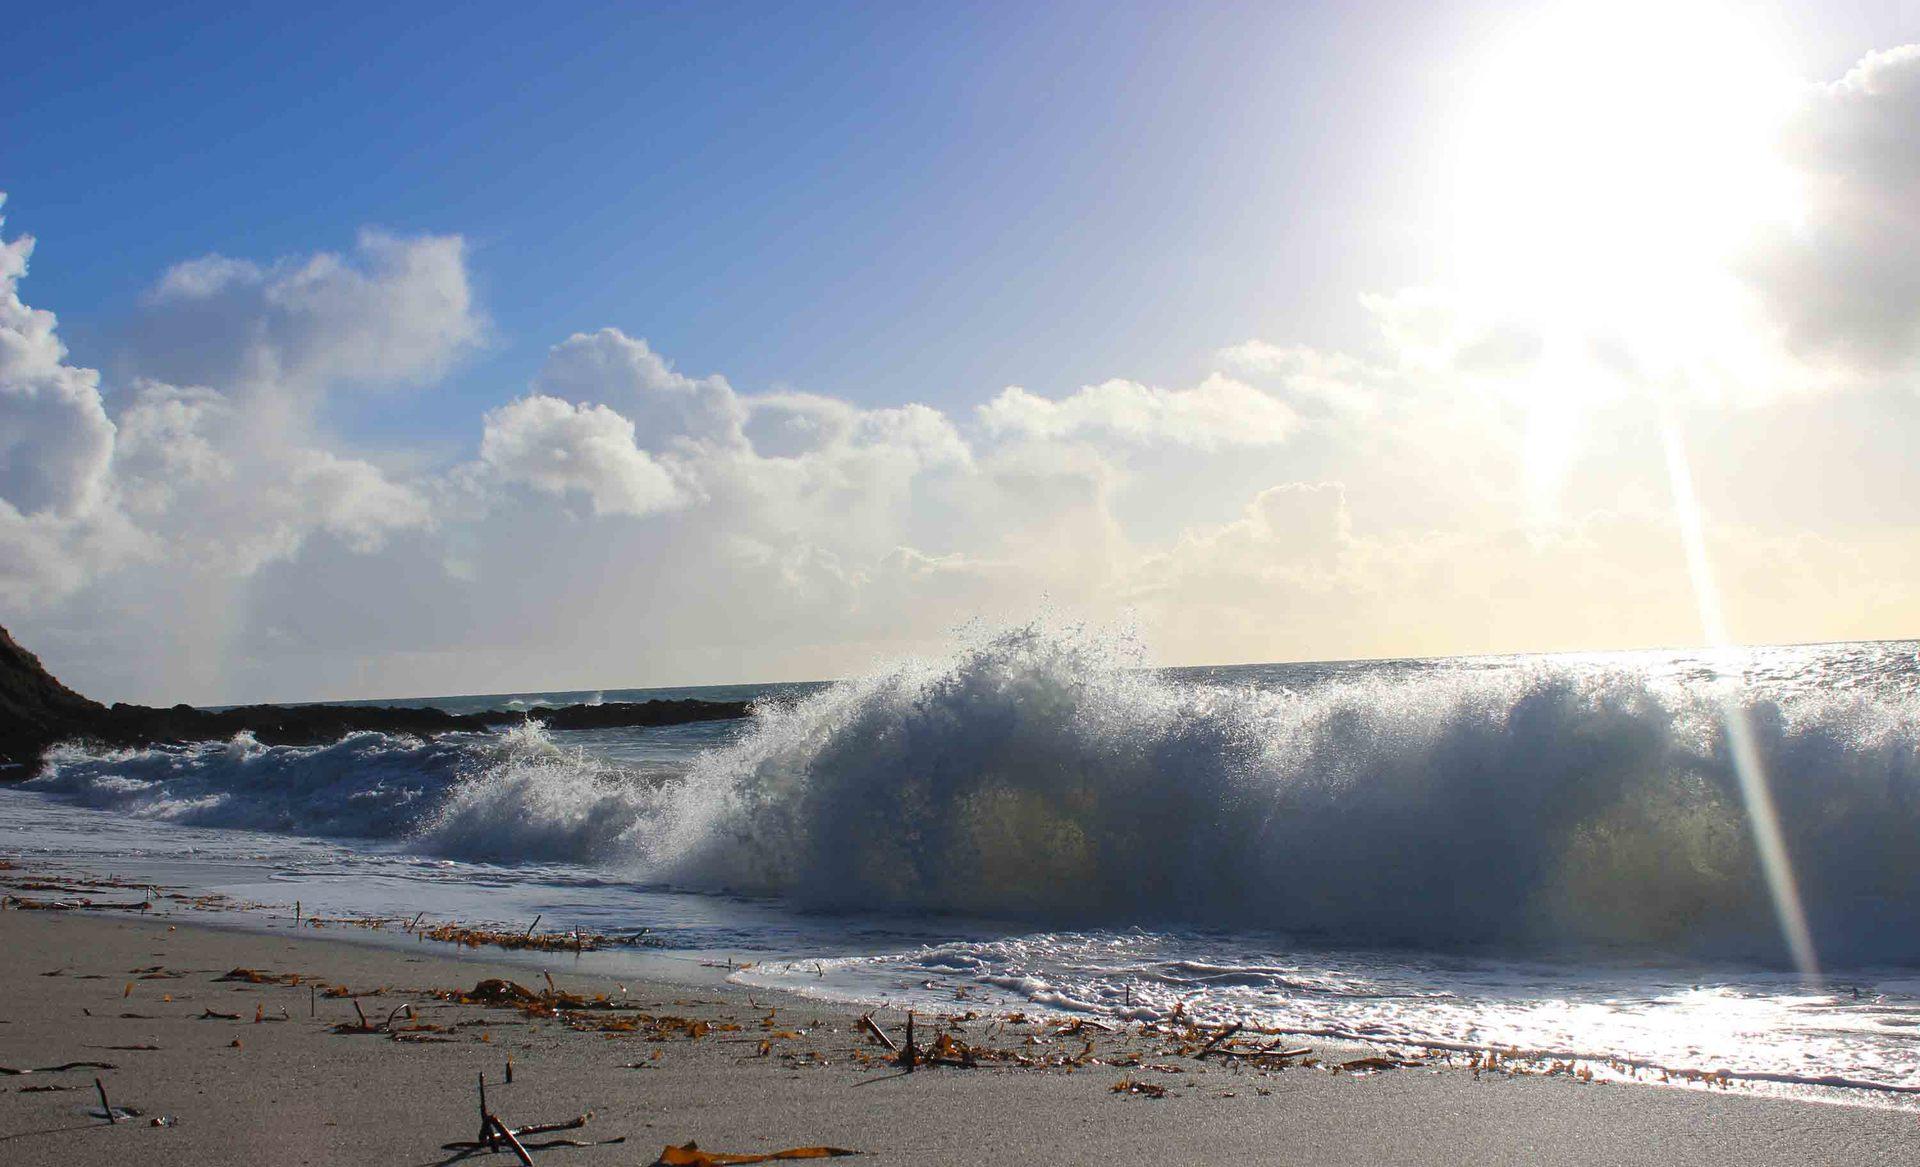 waves crashing on Vault Beach L A Kent Rogue Flamingo D I Treloar